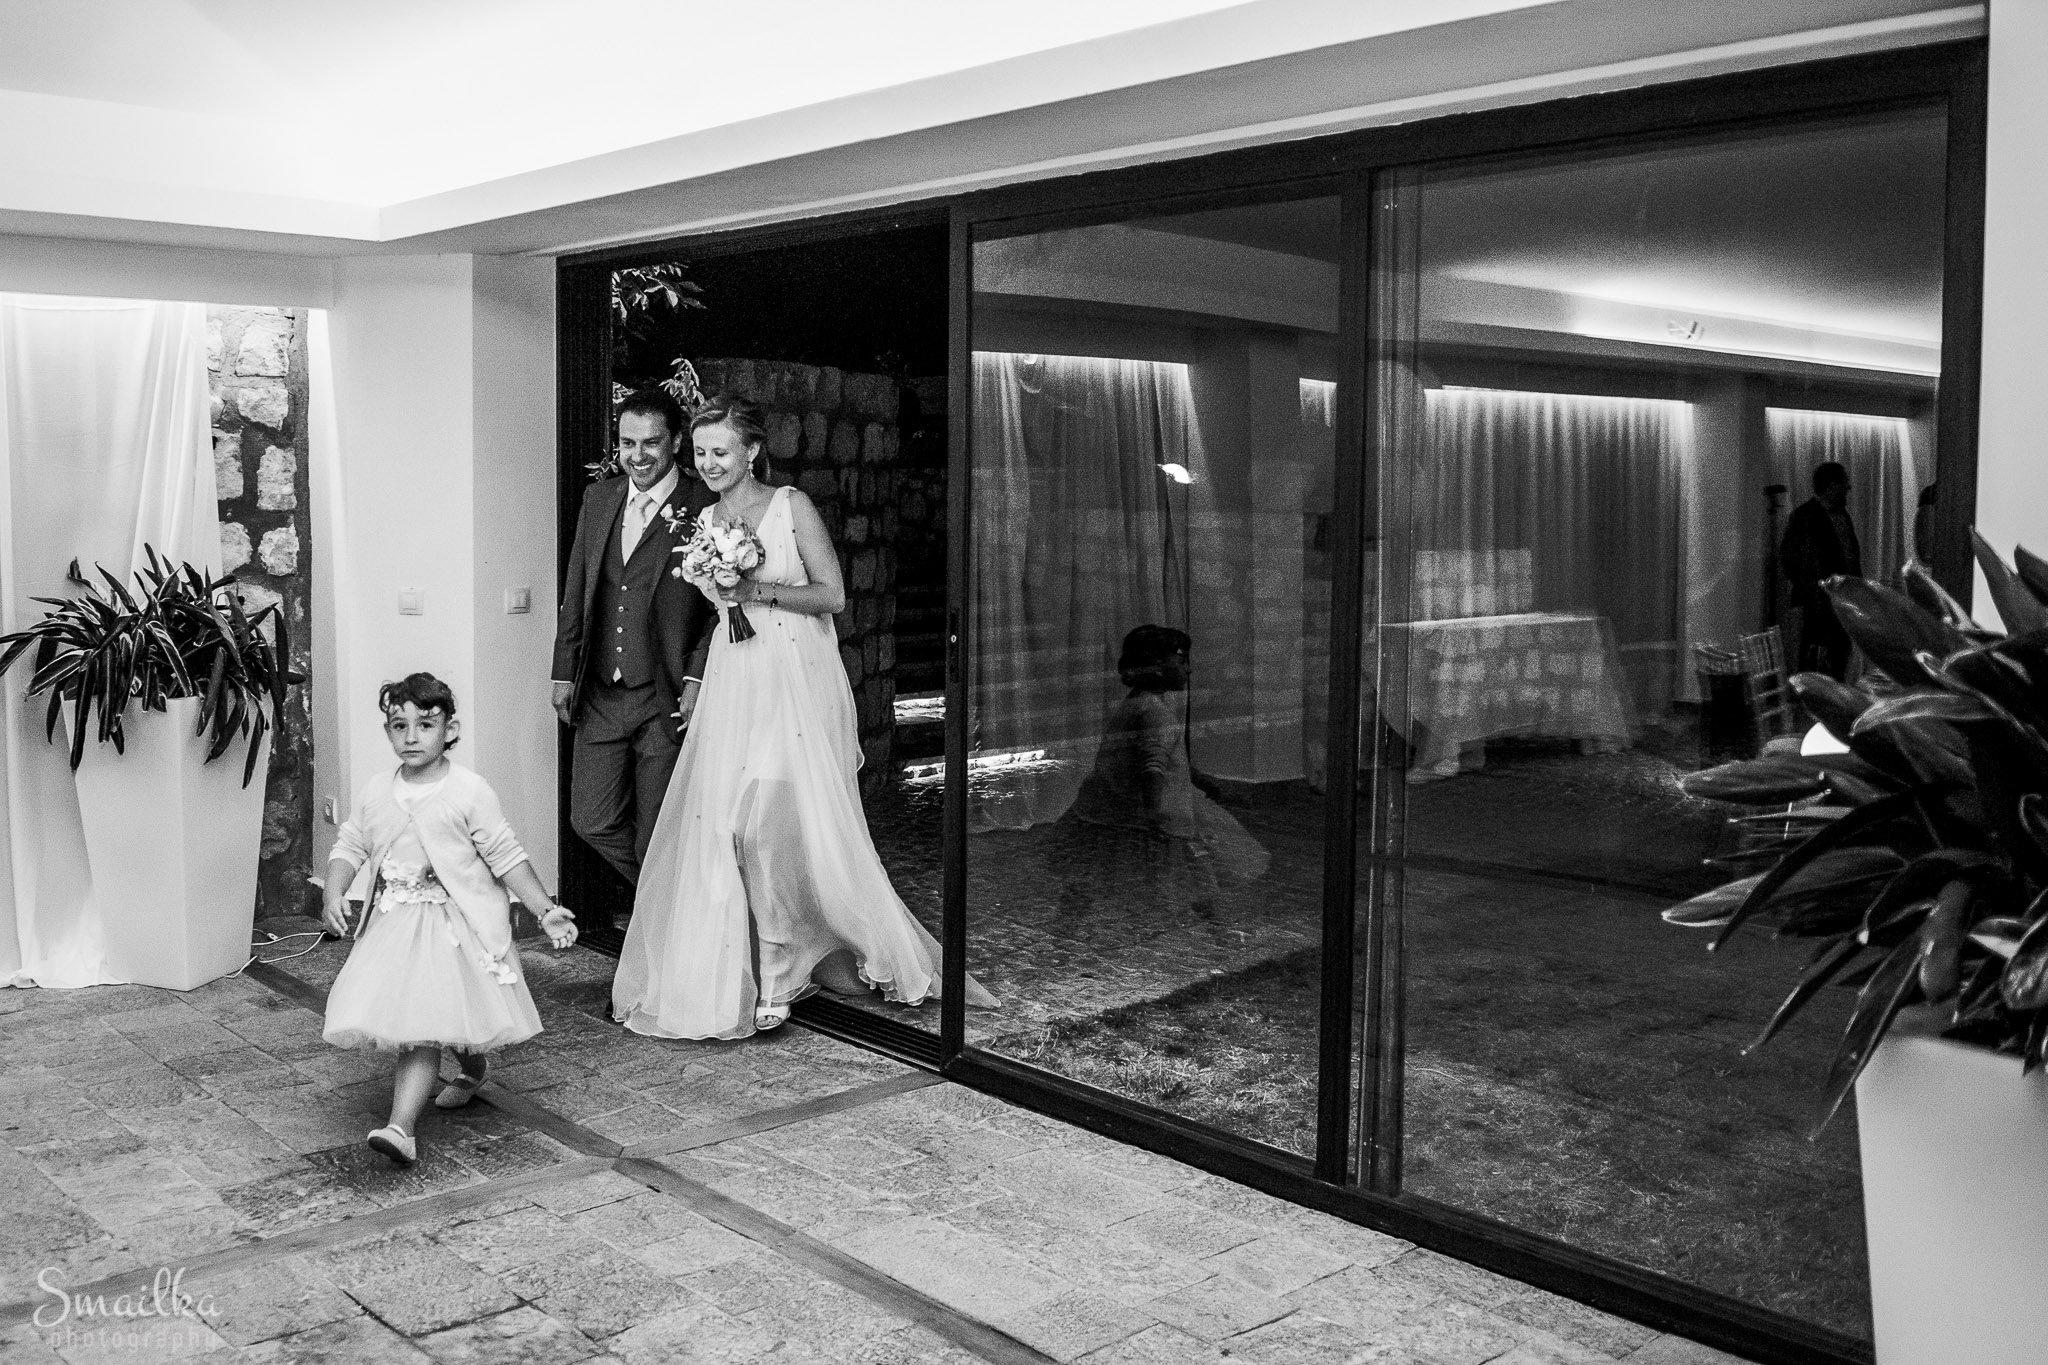 Ana and Boz entering the wedding restaurant